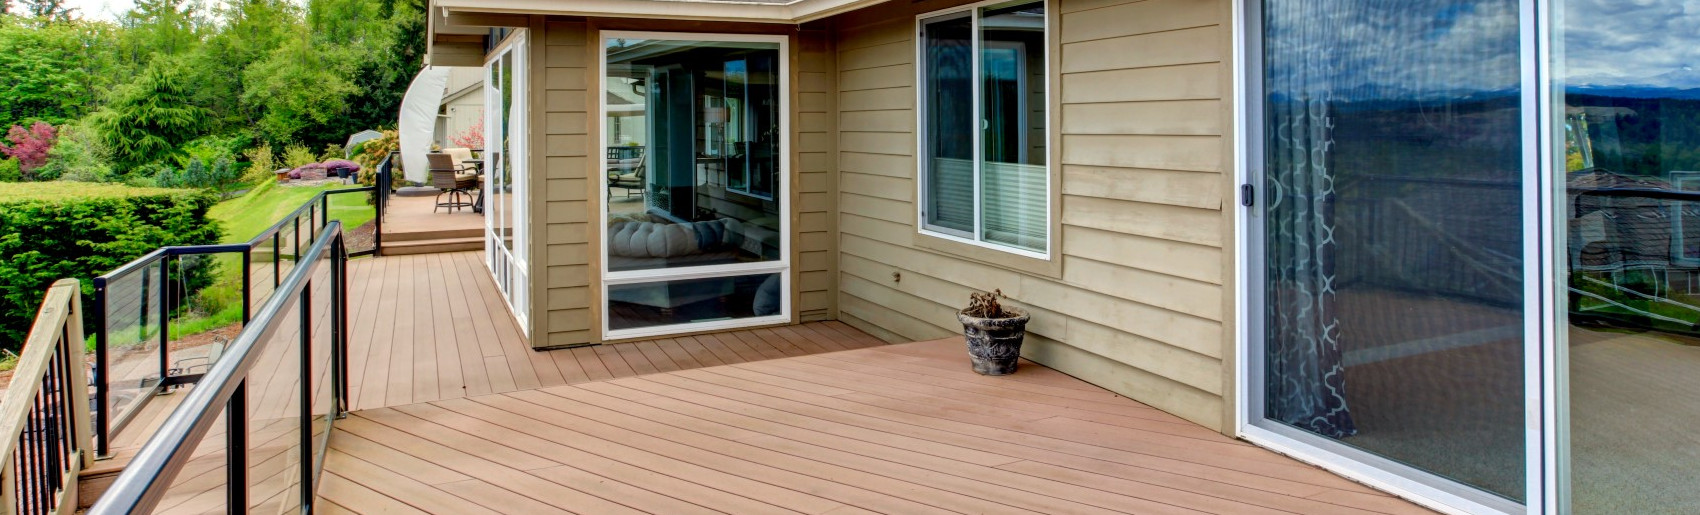 Benefits with a Deck Restoration